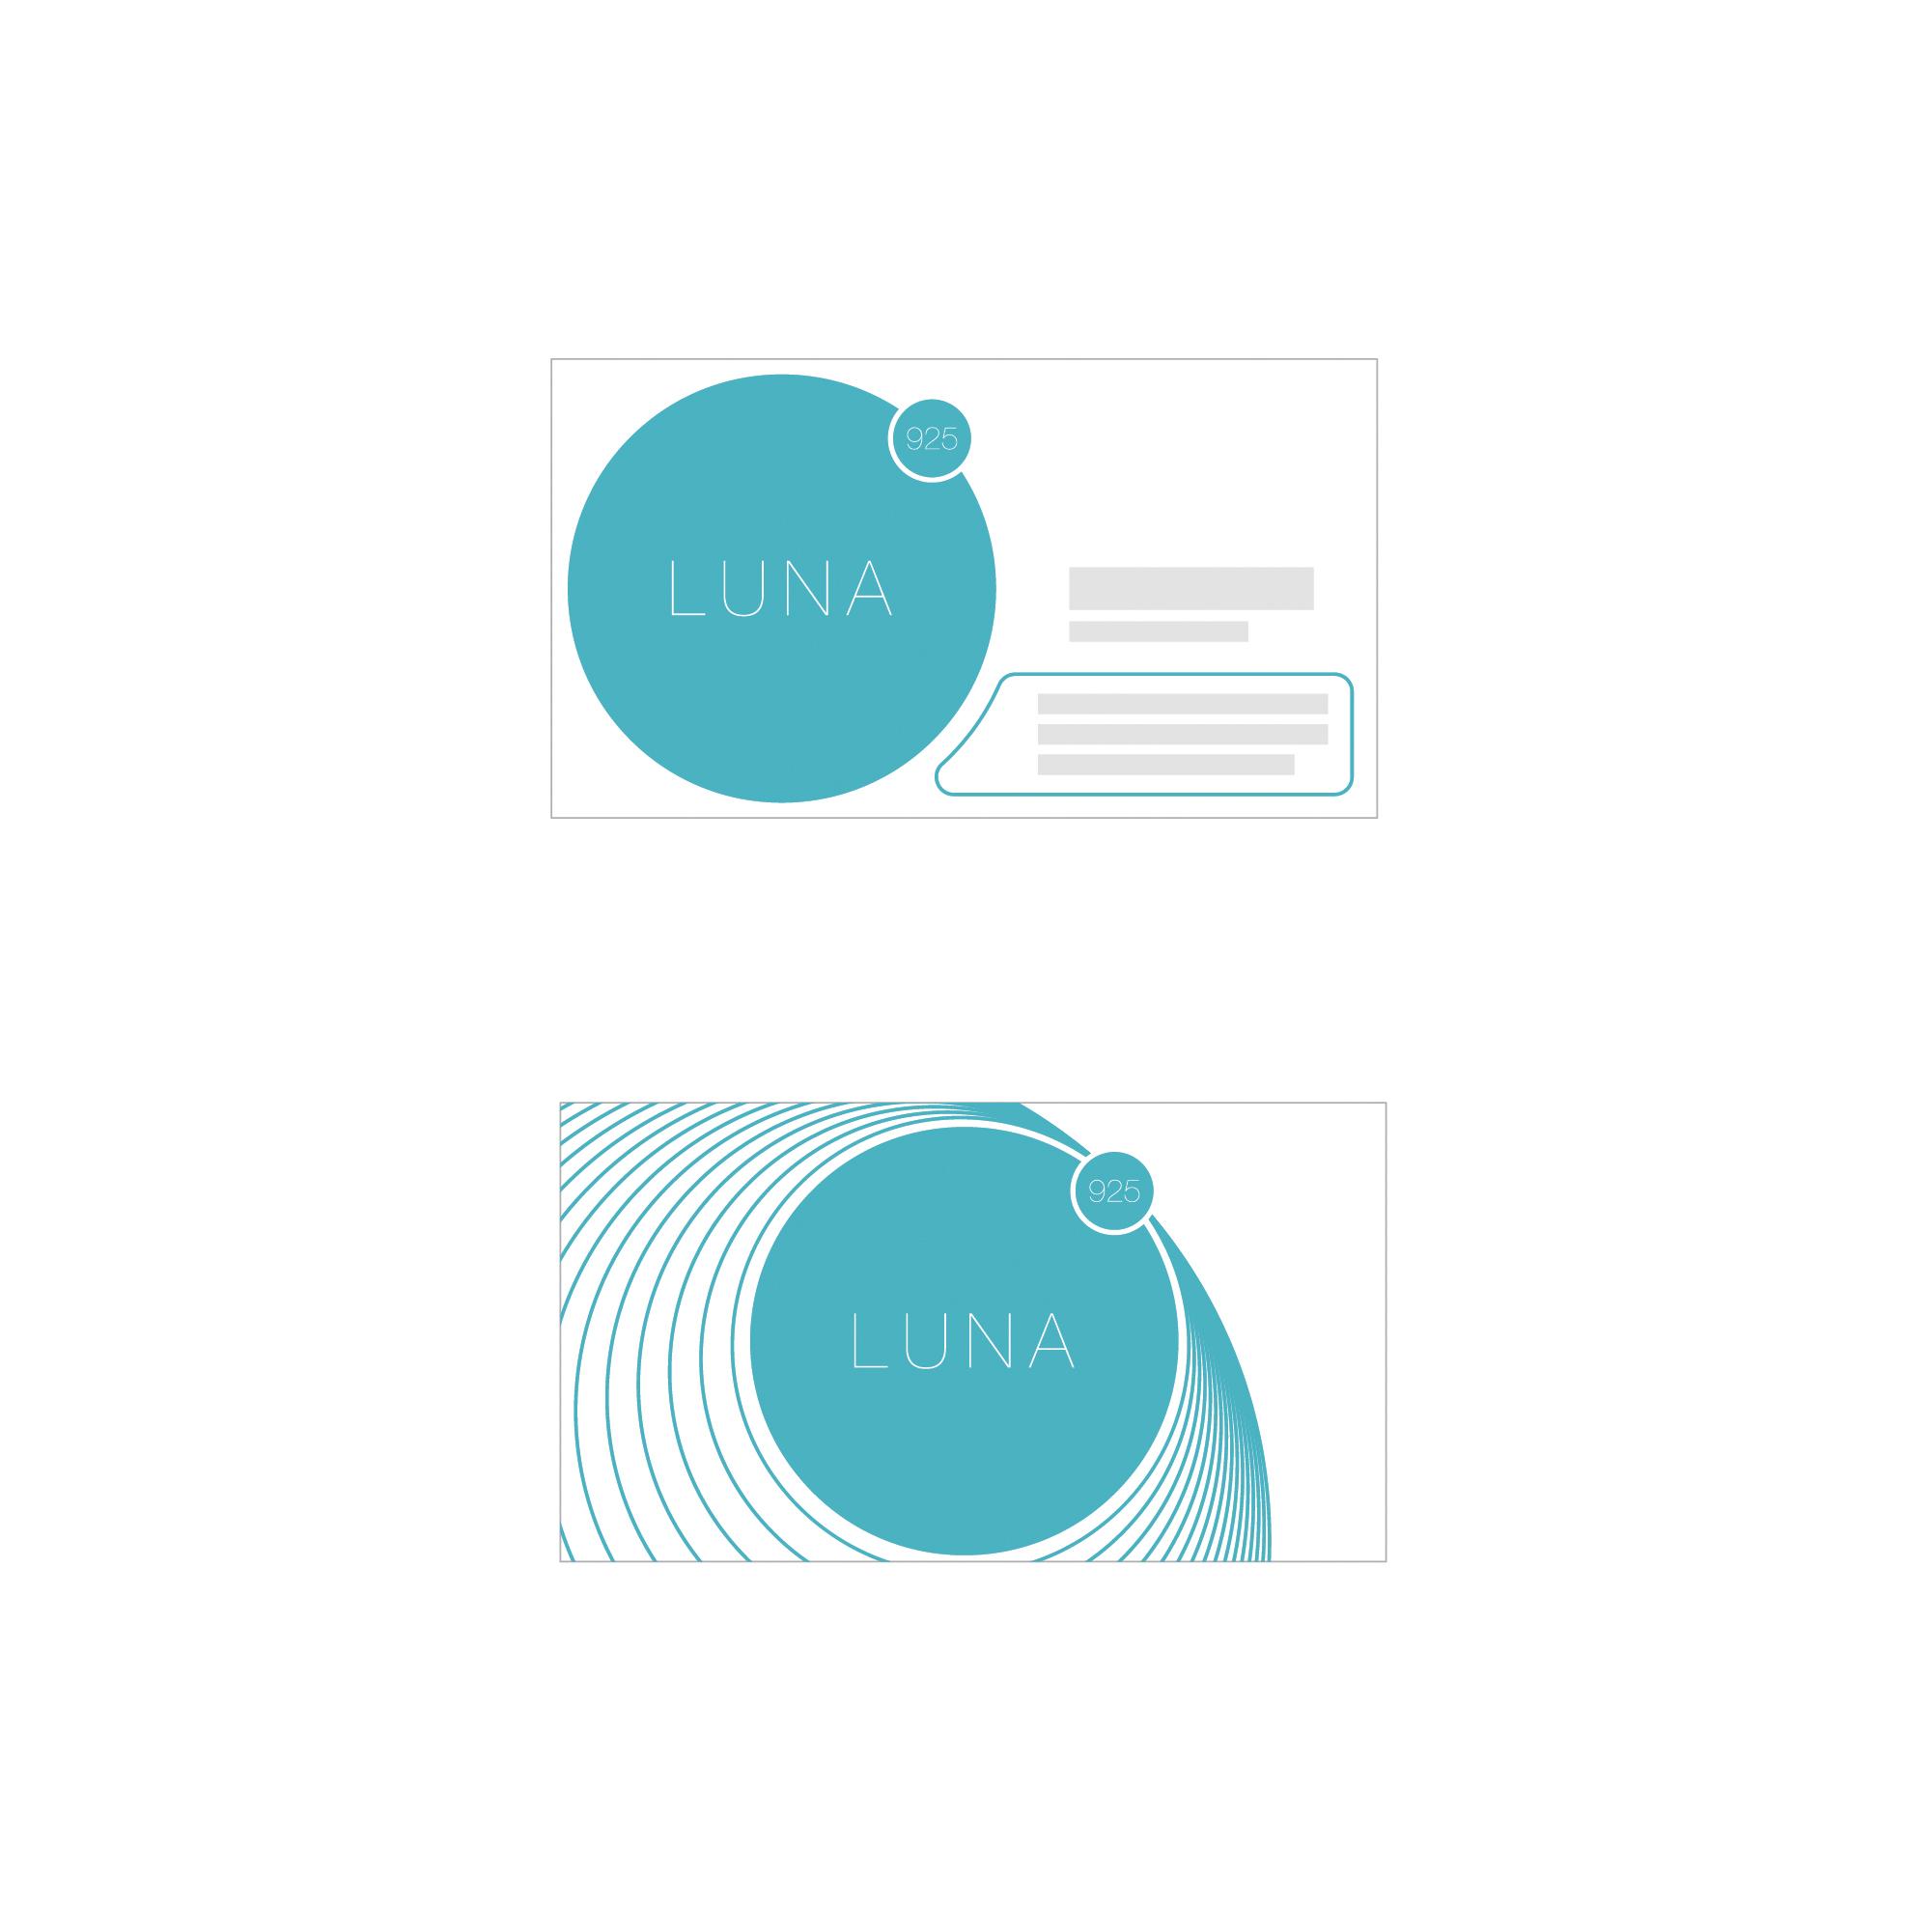 Логотип для столового серебра и посуды из серебра фото f_5545bab796277d2b.jpg